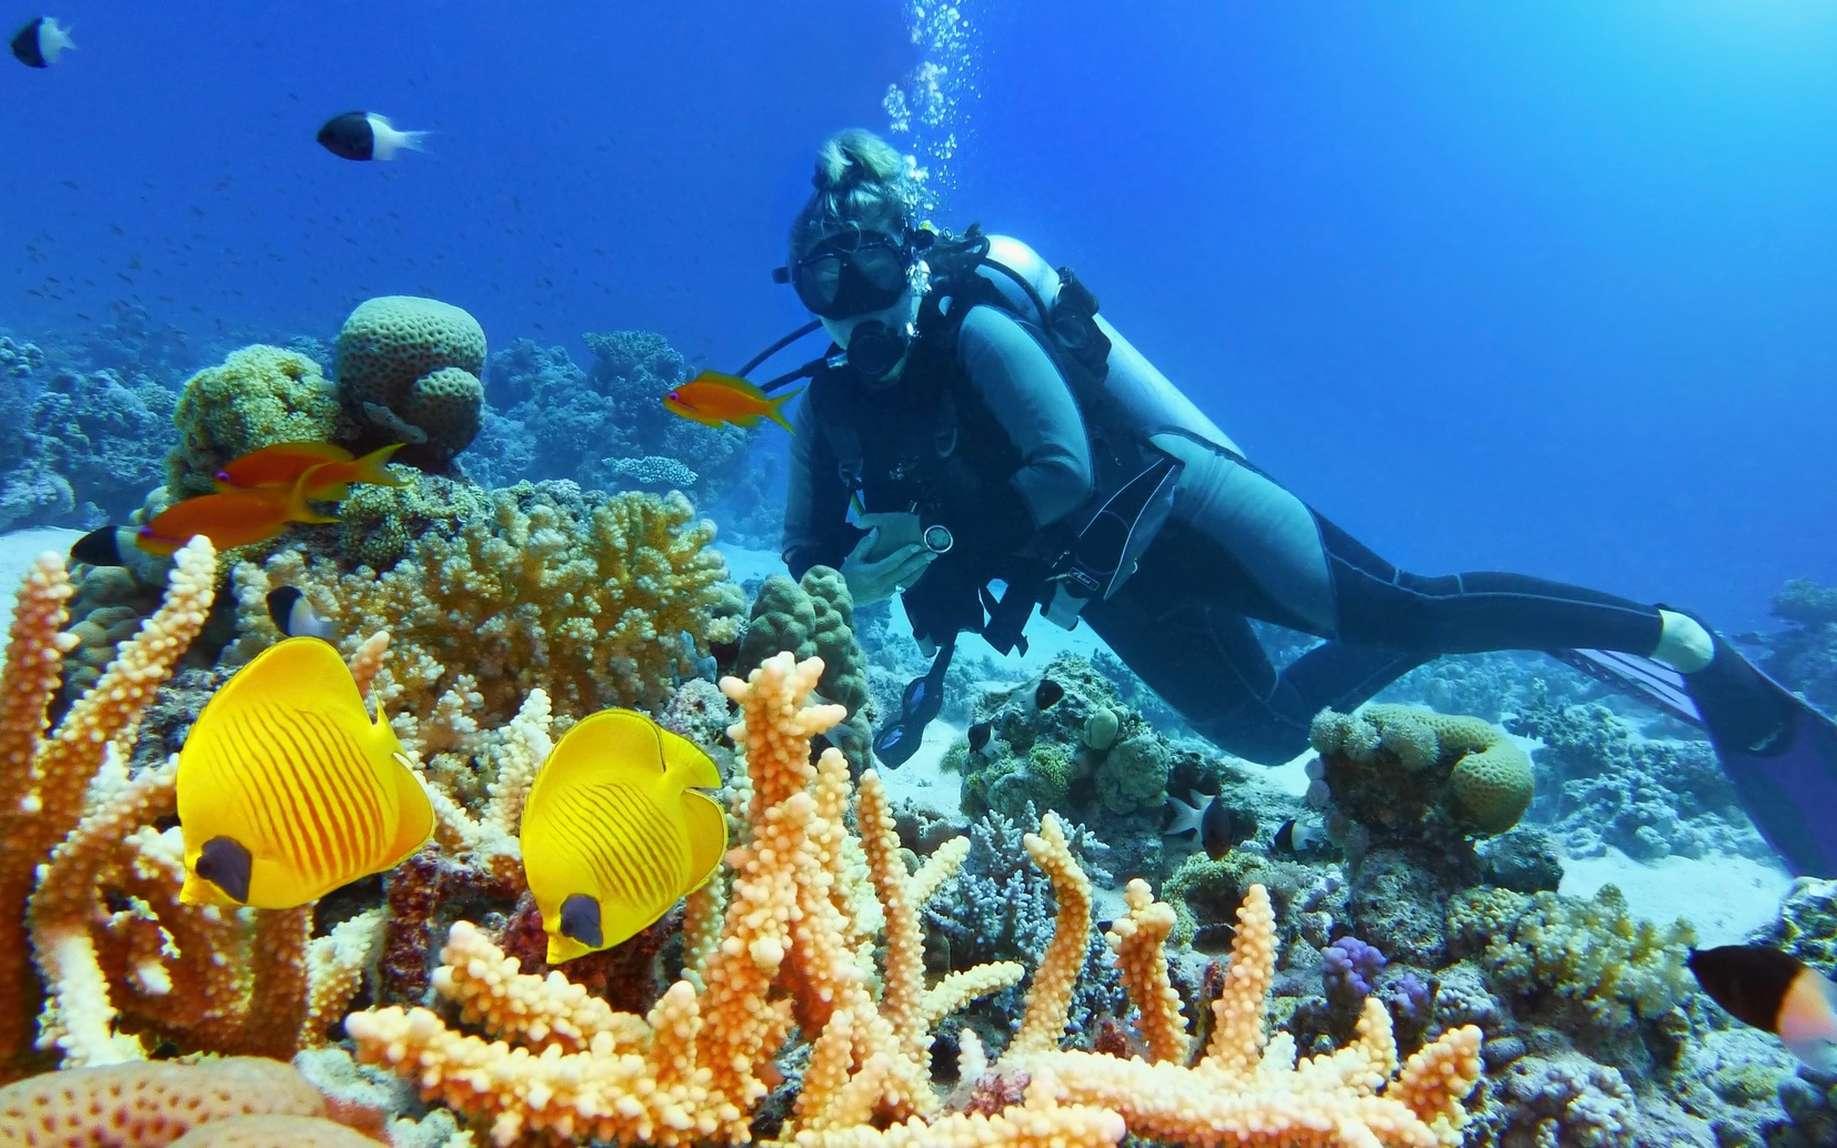 Plongée en Guadeloupe © Tunatura, Fotolia